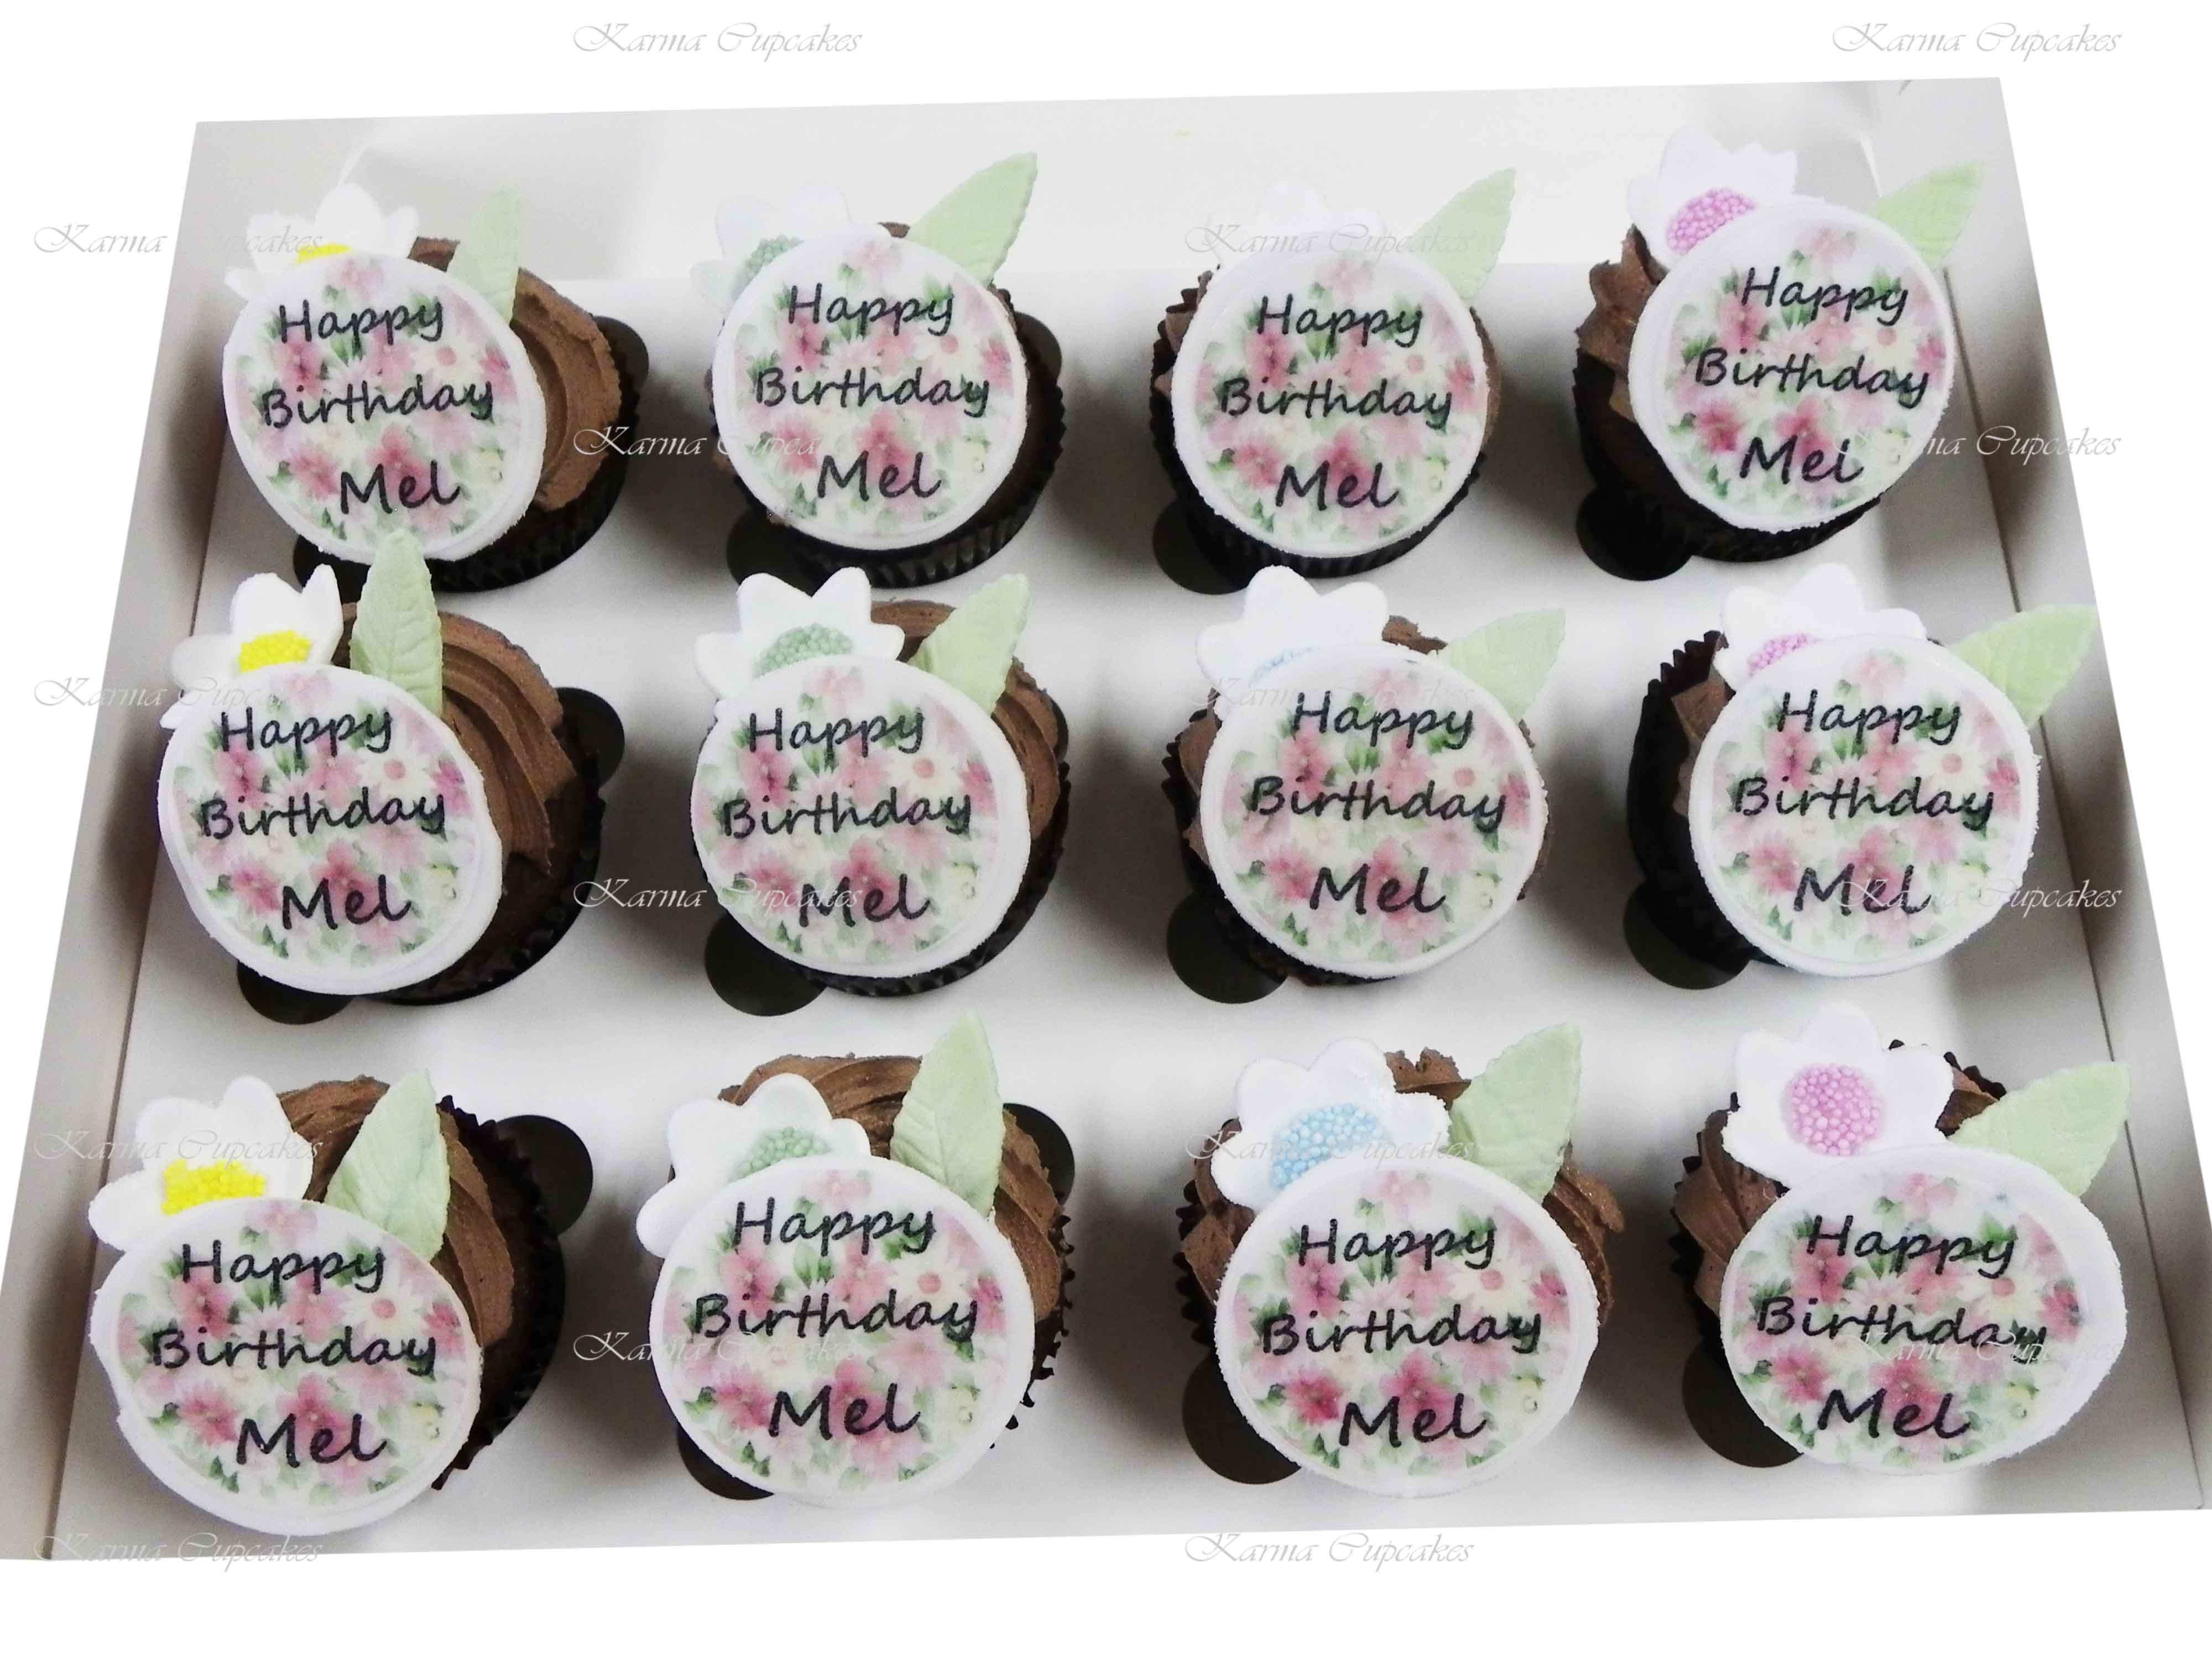 Vegan Birthday Cupcakes with Edible Photo